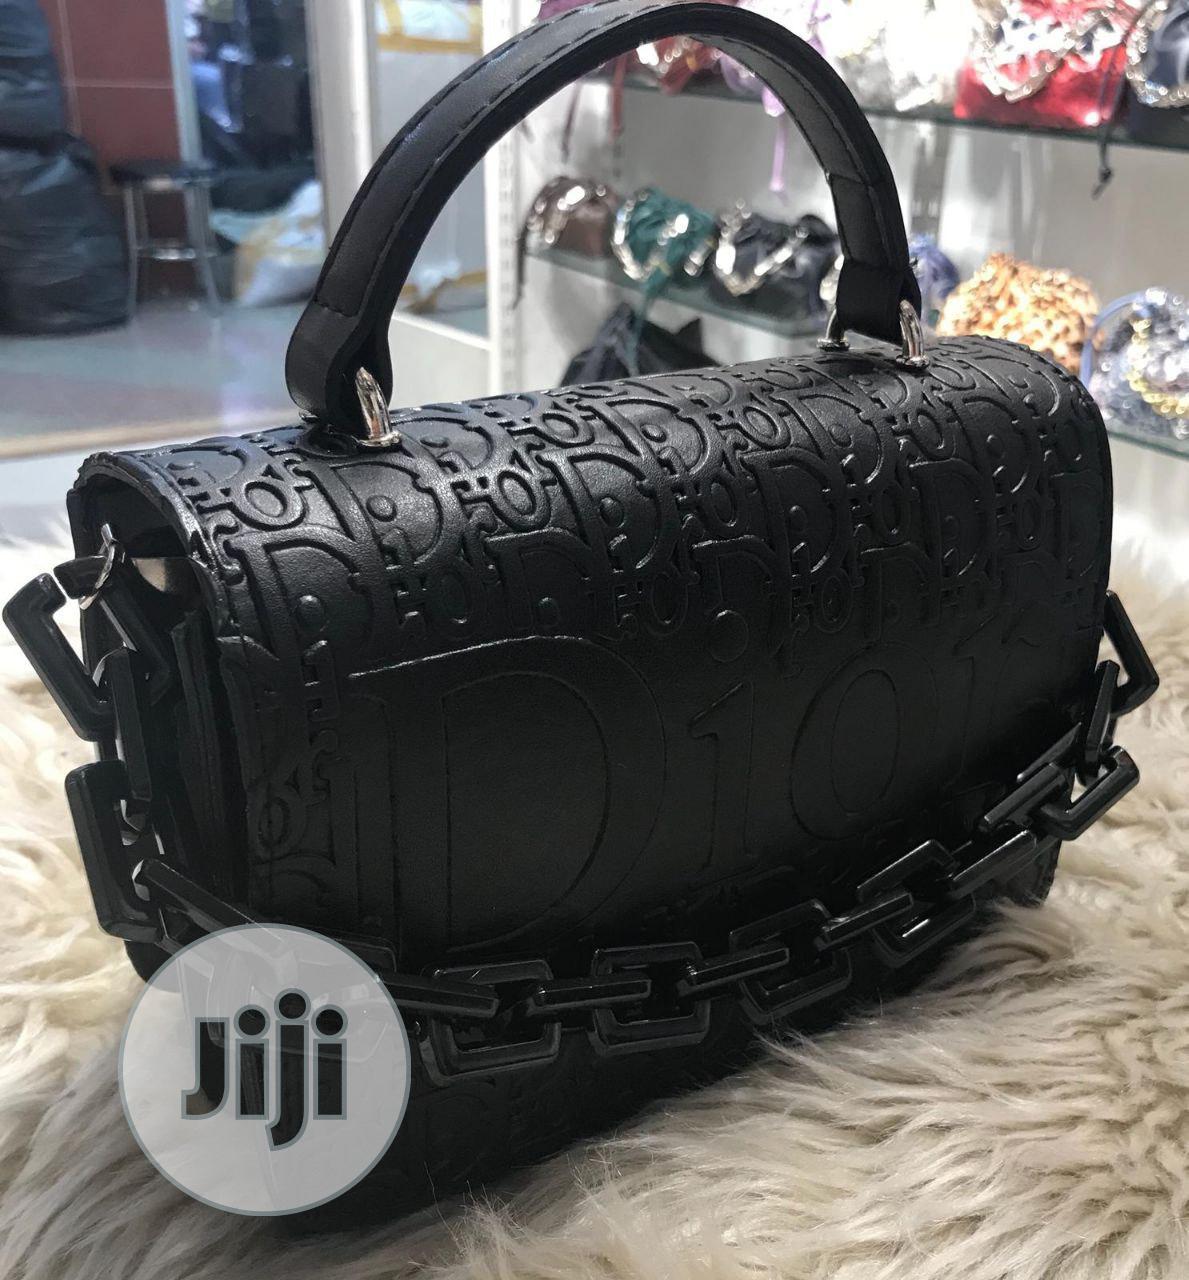 Ladies Handbag | Bags for sale in Dutse-Alhaji, Abuja (FCT) State, Nigeria